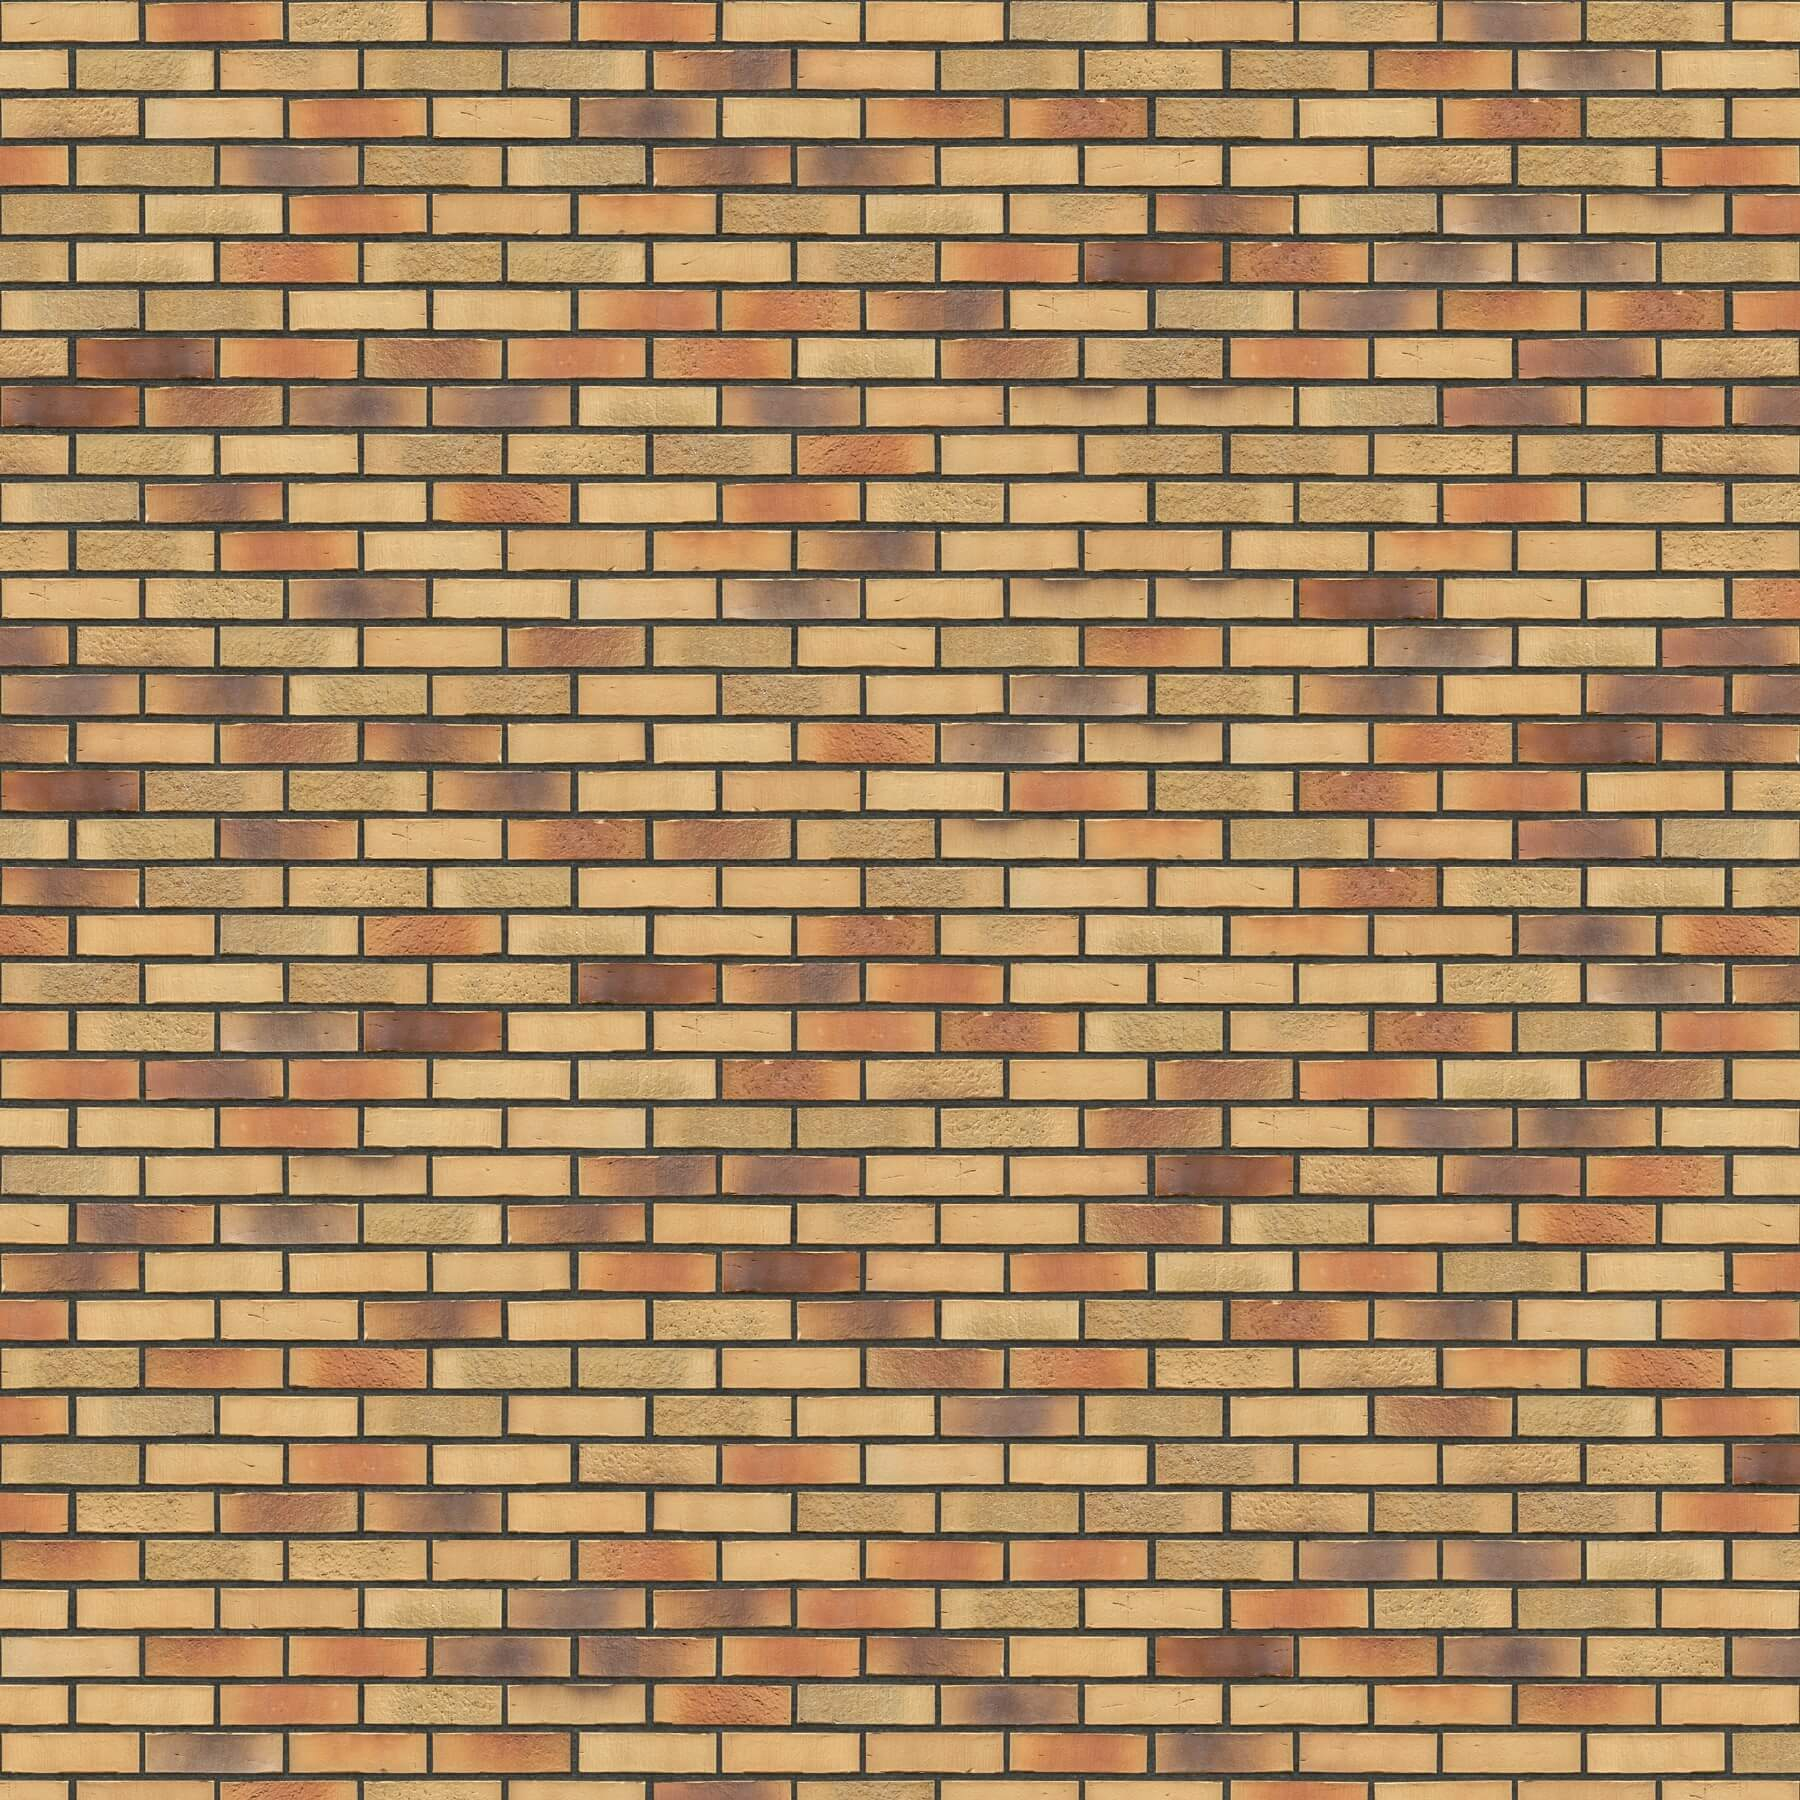 Puna-cigla-FeldHaus-Klinker-brick-house-beograd-nf-k-915-Antracit Fuga